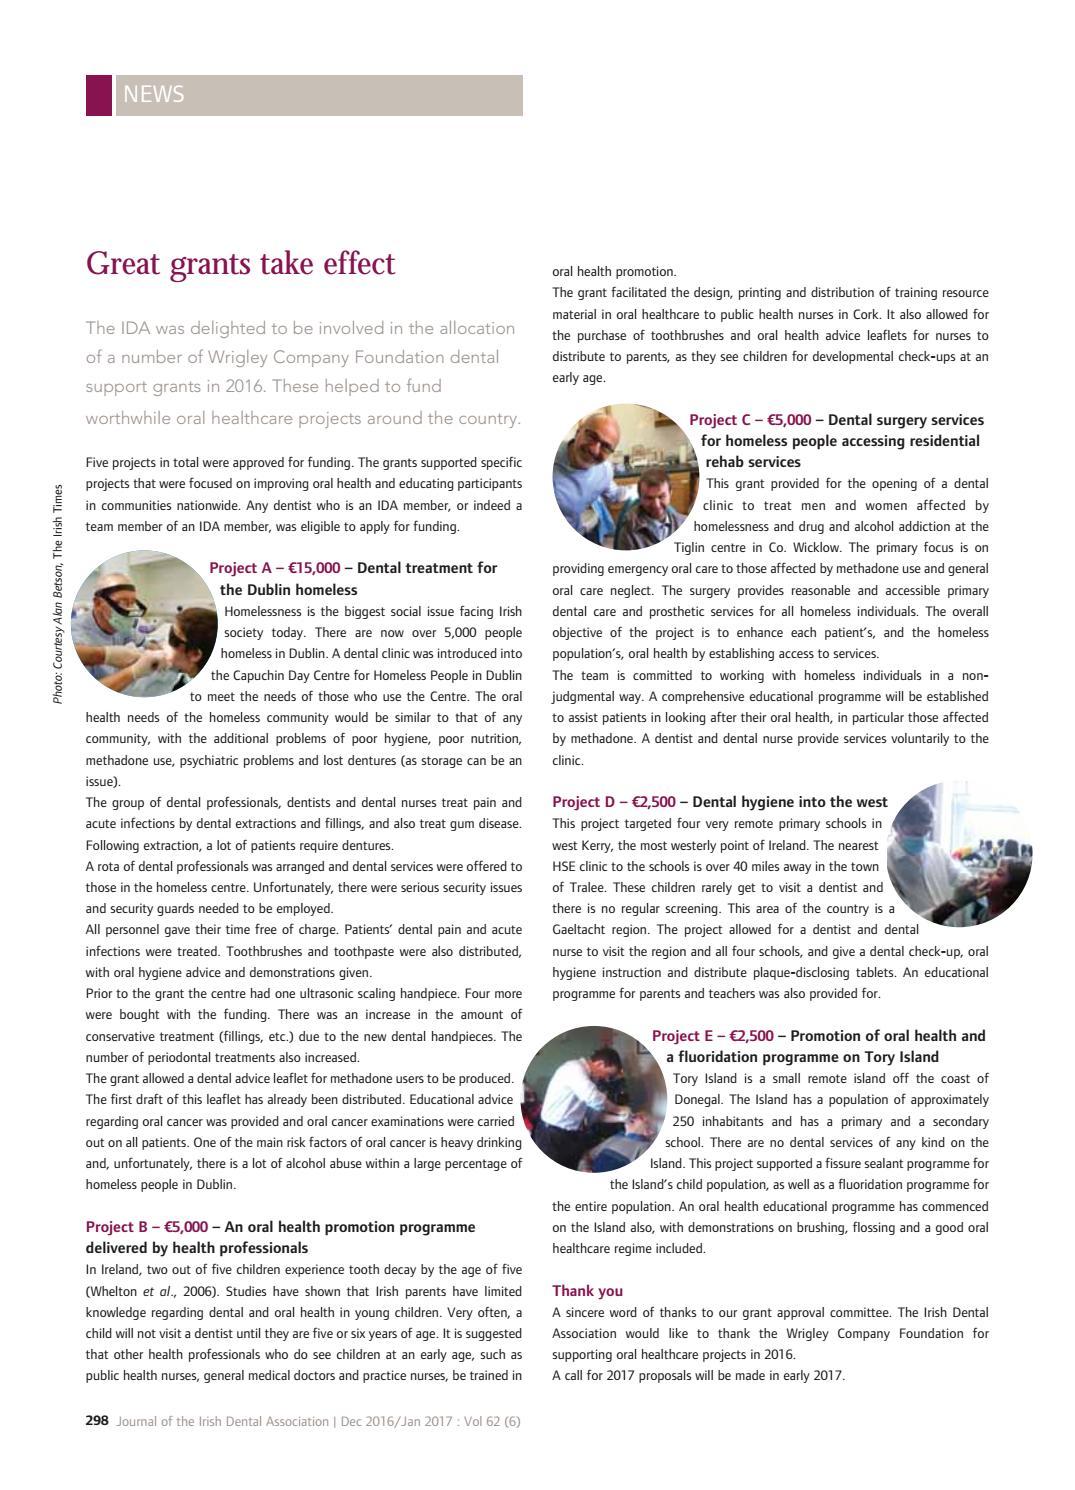 Journal of the Irish Dental Association December January